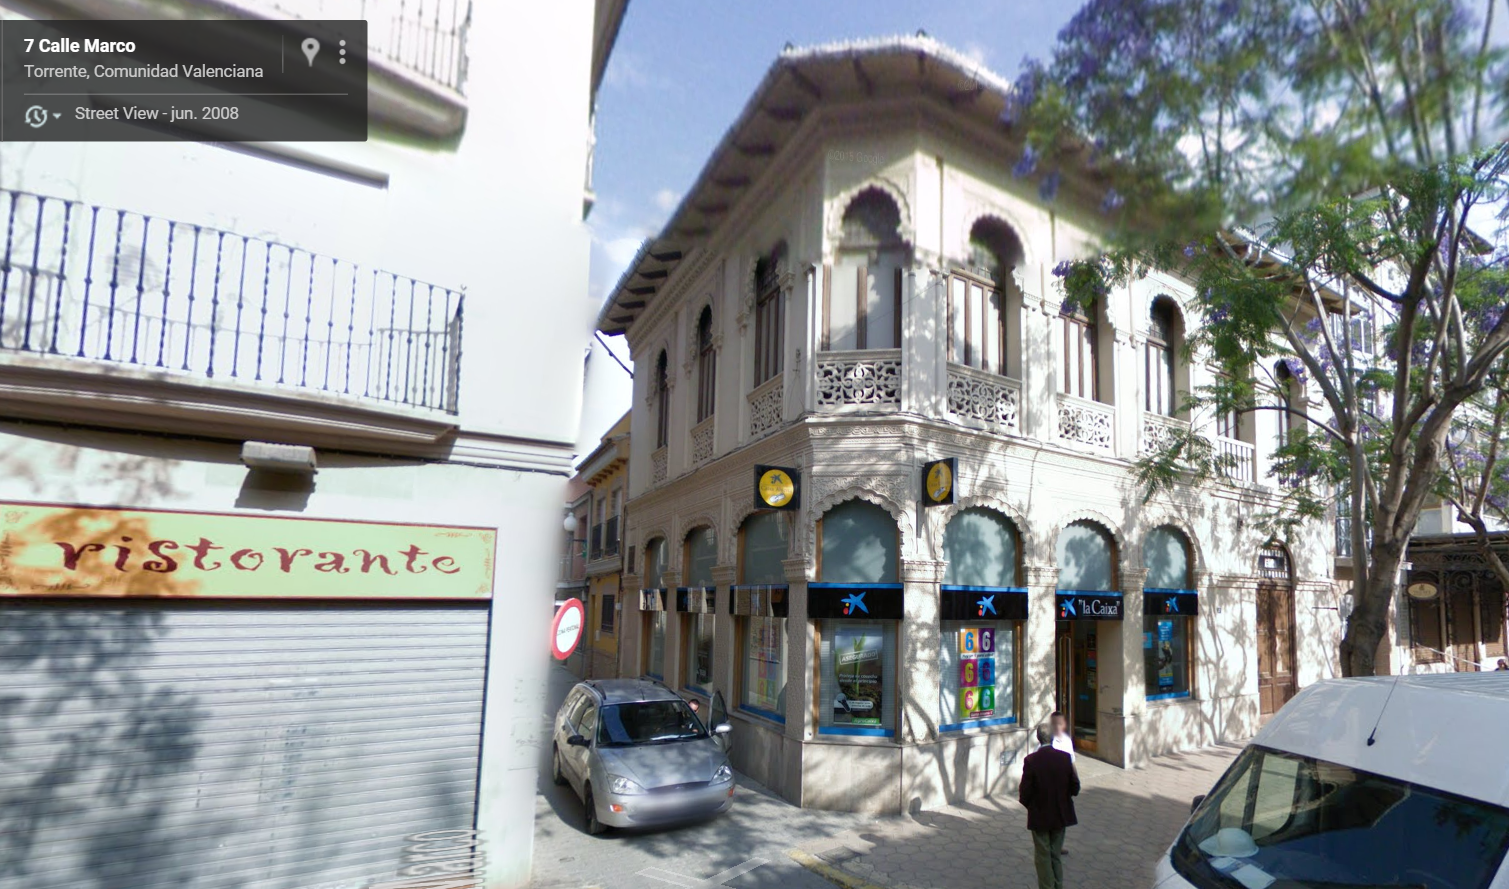 La antigua discoteca Alhambra en la actualidad,